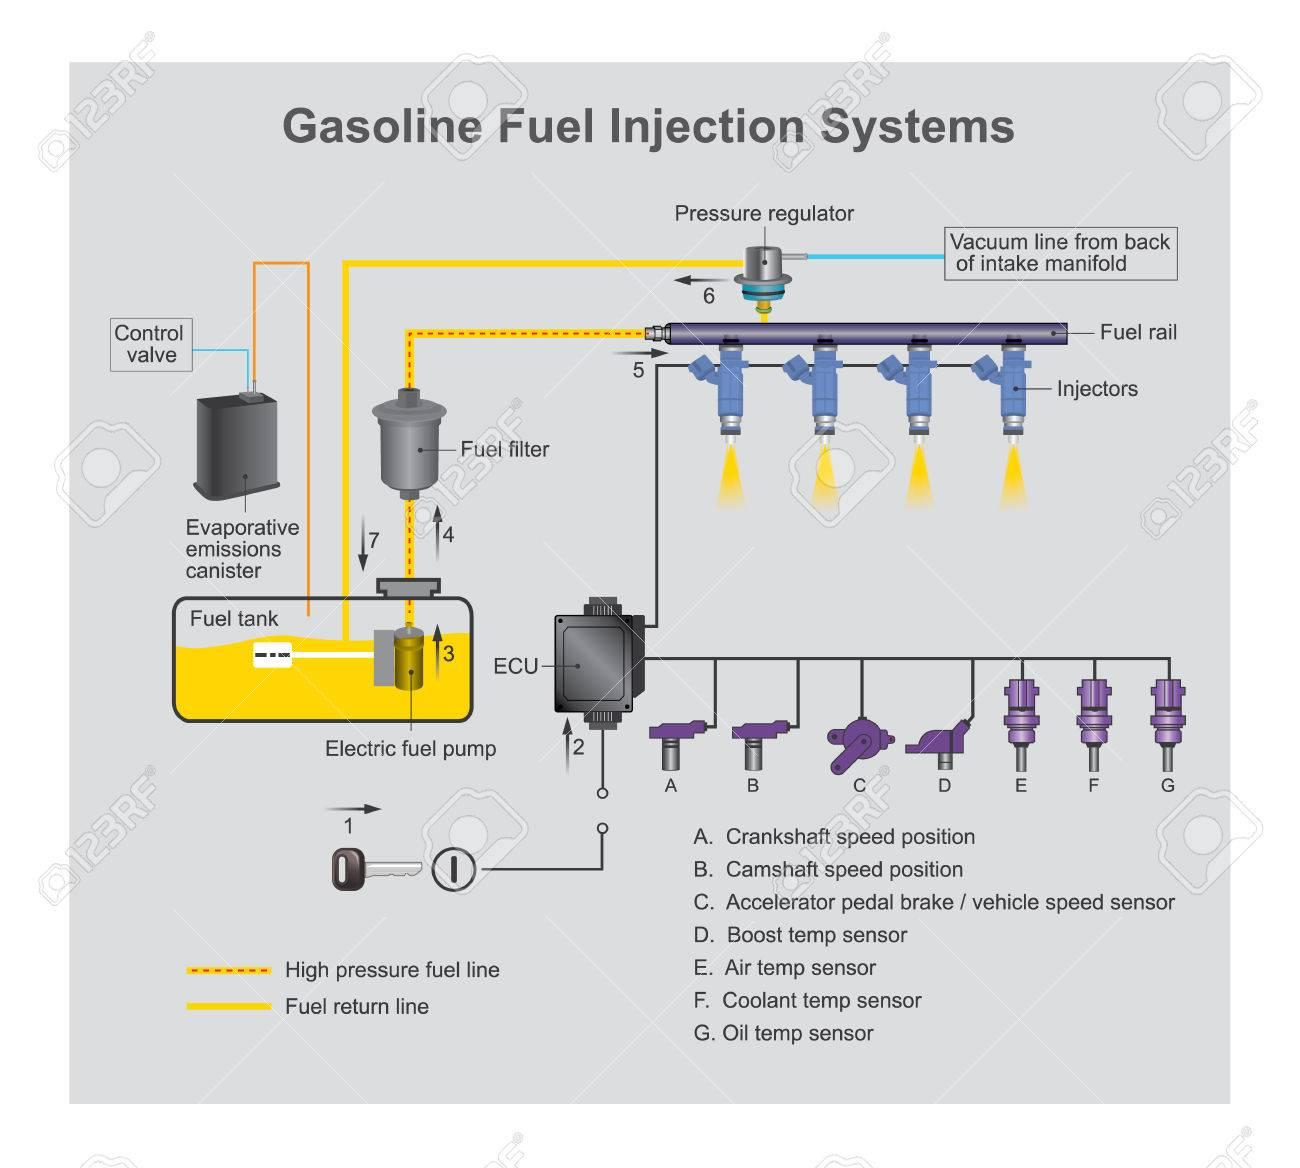 Oil Temp Sensor Wiring Diagram on